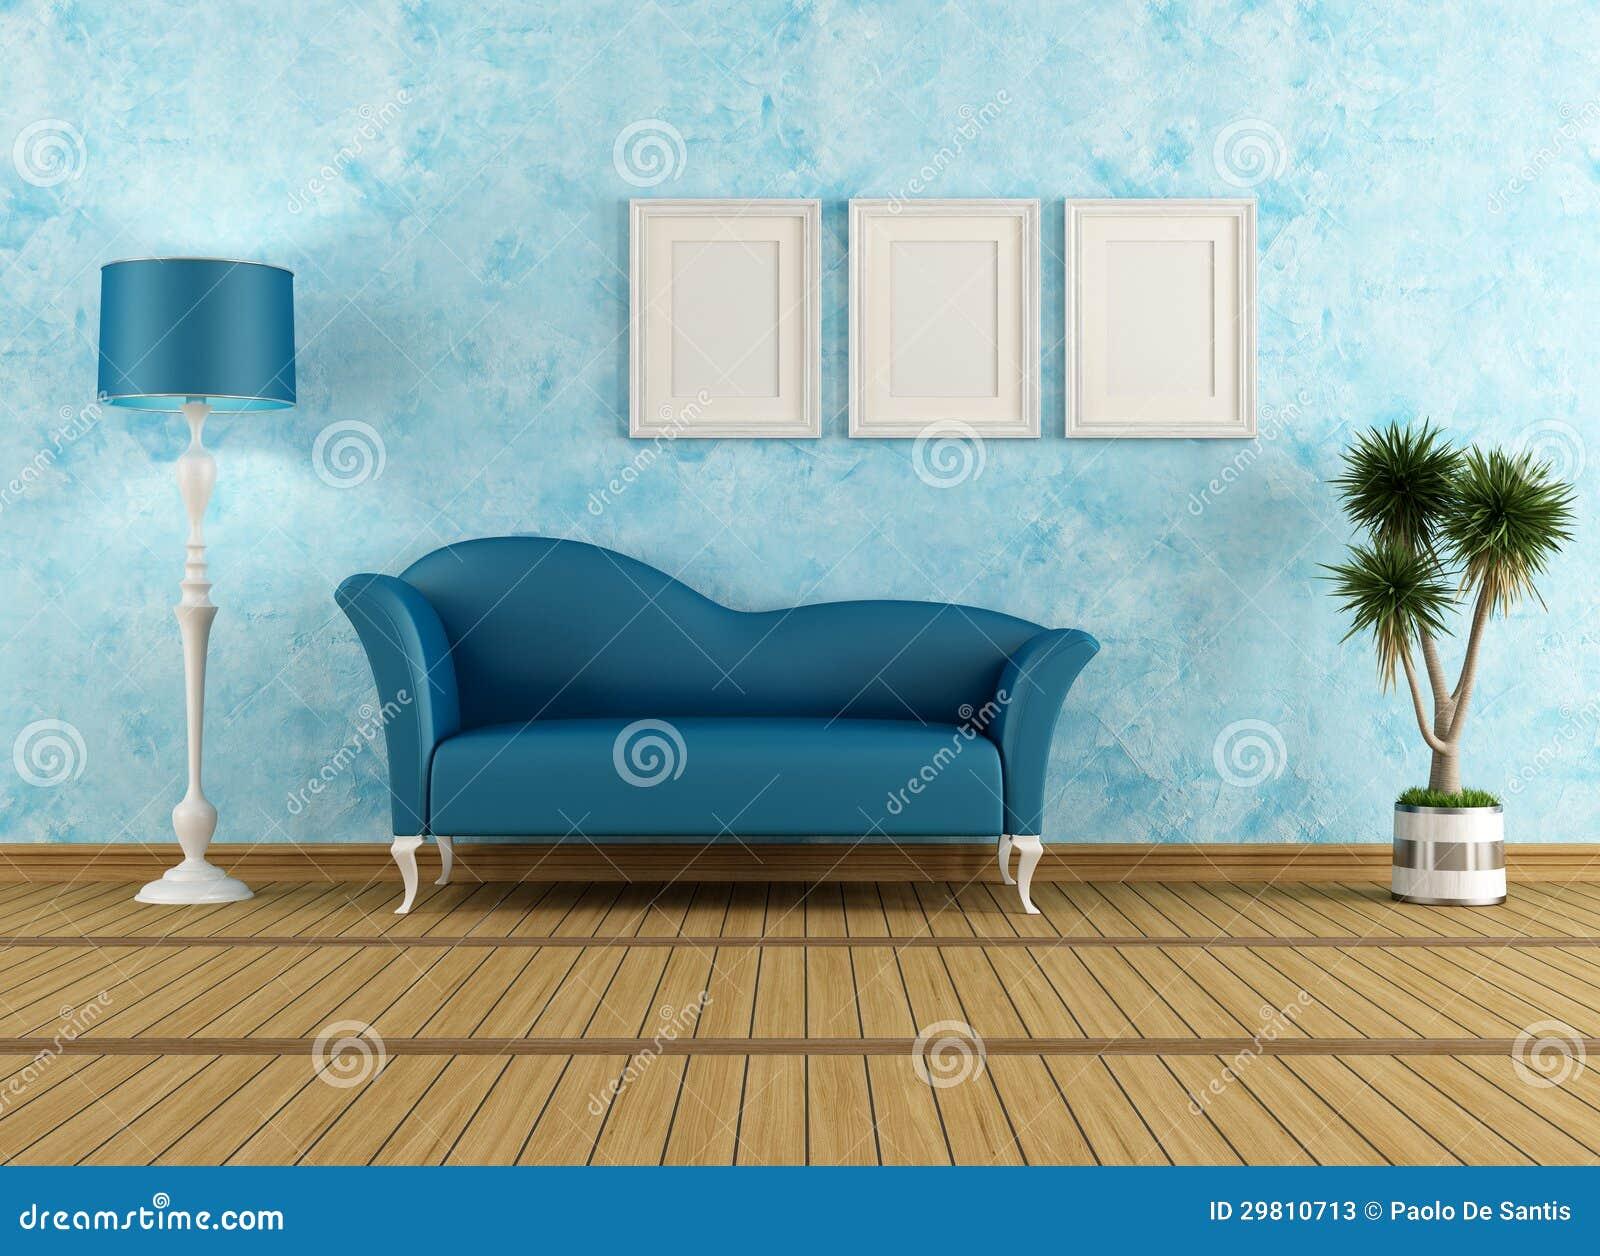 Wohnzimmer Blaues Sofa Midir